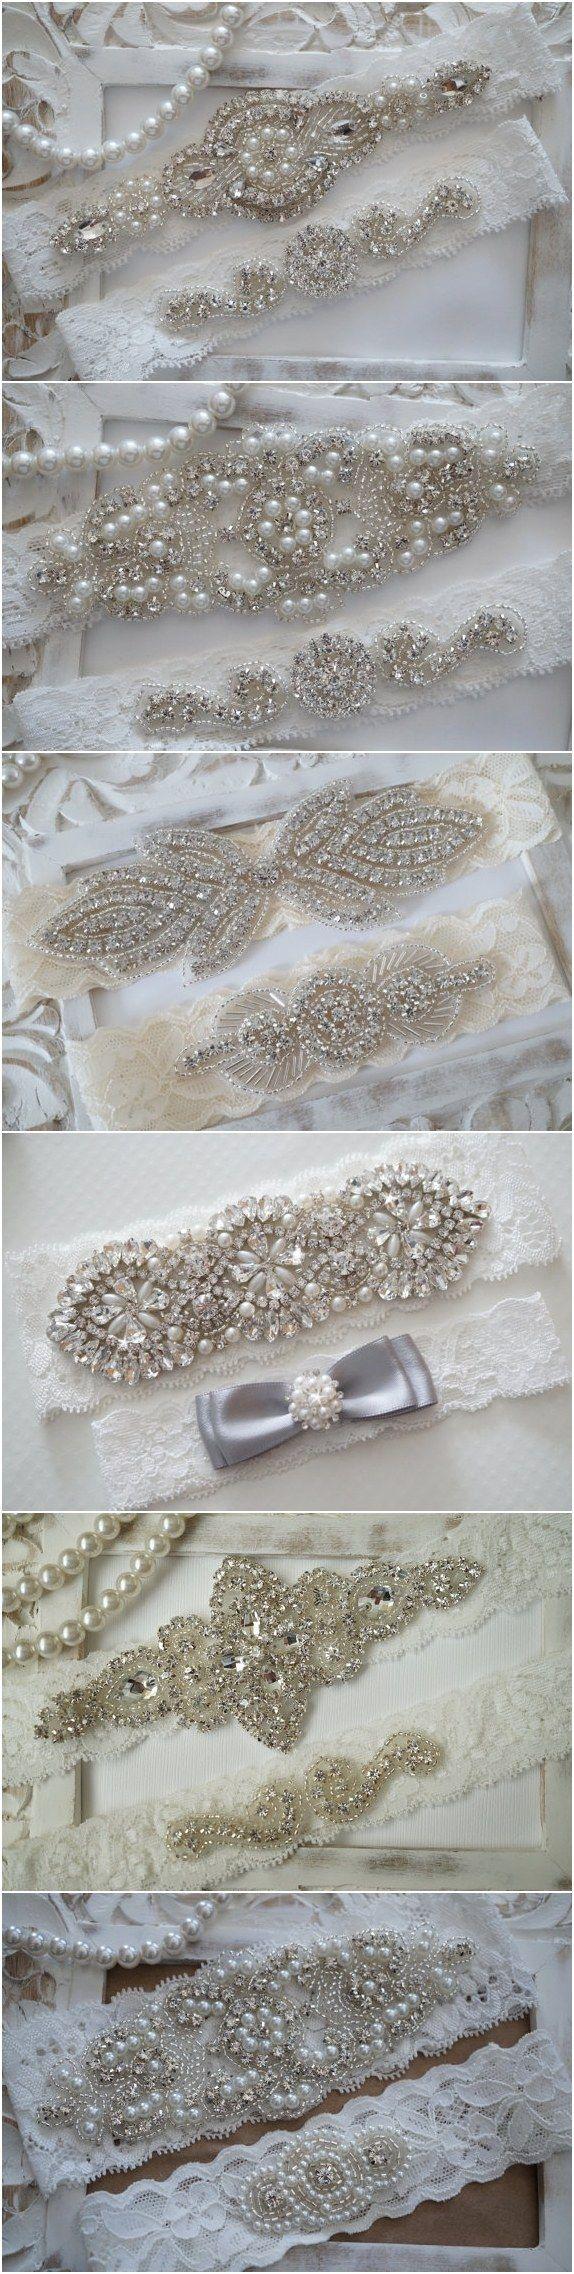 Rustic Wedding Garter Set via OneFancyDay / http://www.deerpearlflowers.com/wedding-garters-sets-from-etsy/2/